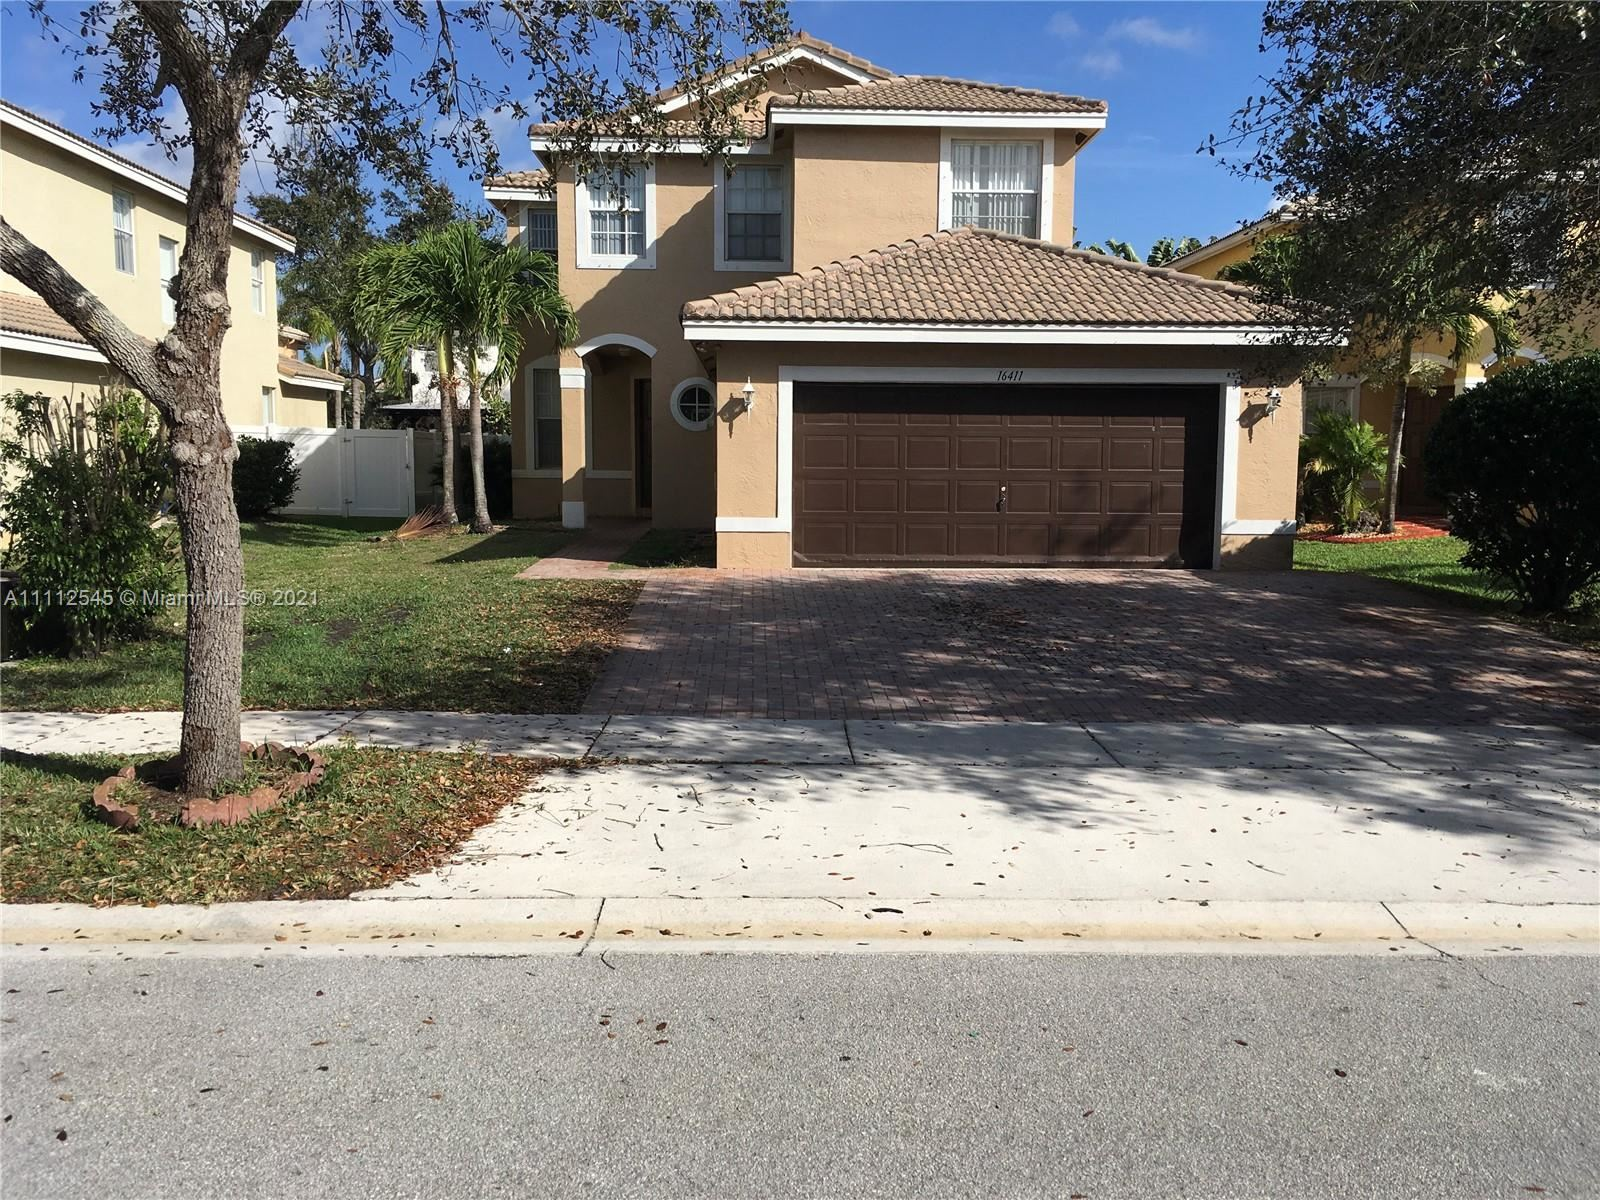 16411 SW 28th St, Miramar, FL 33027 - #: A11112545